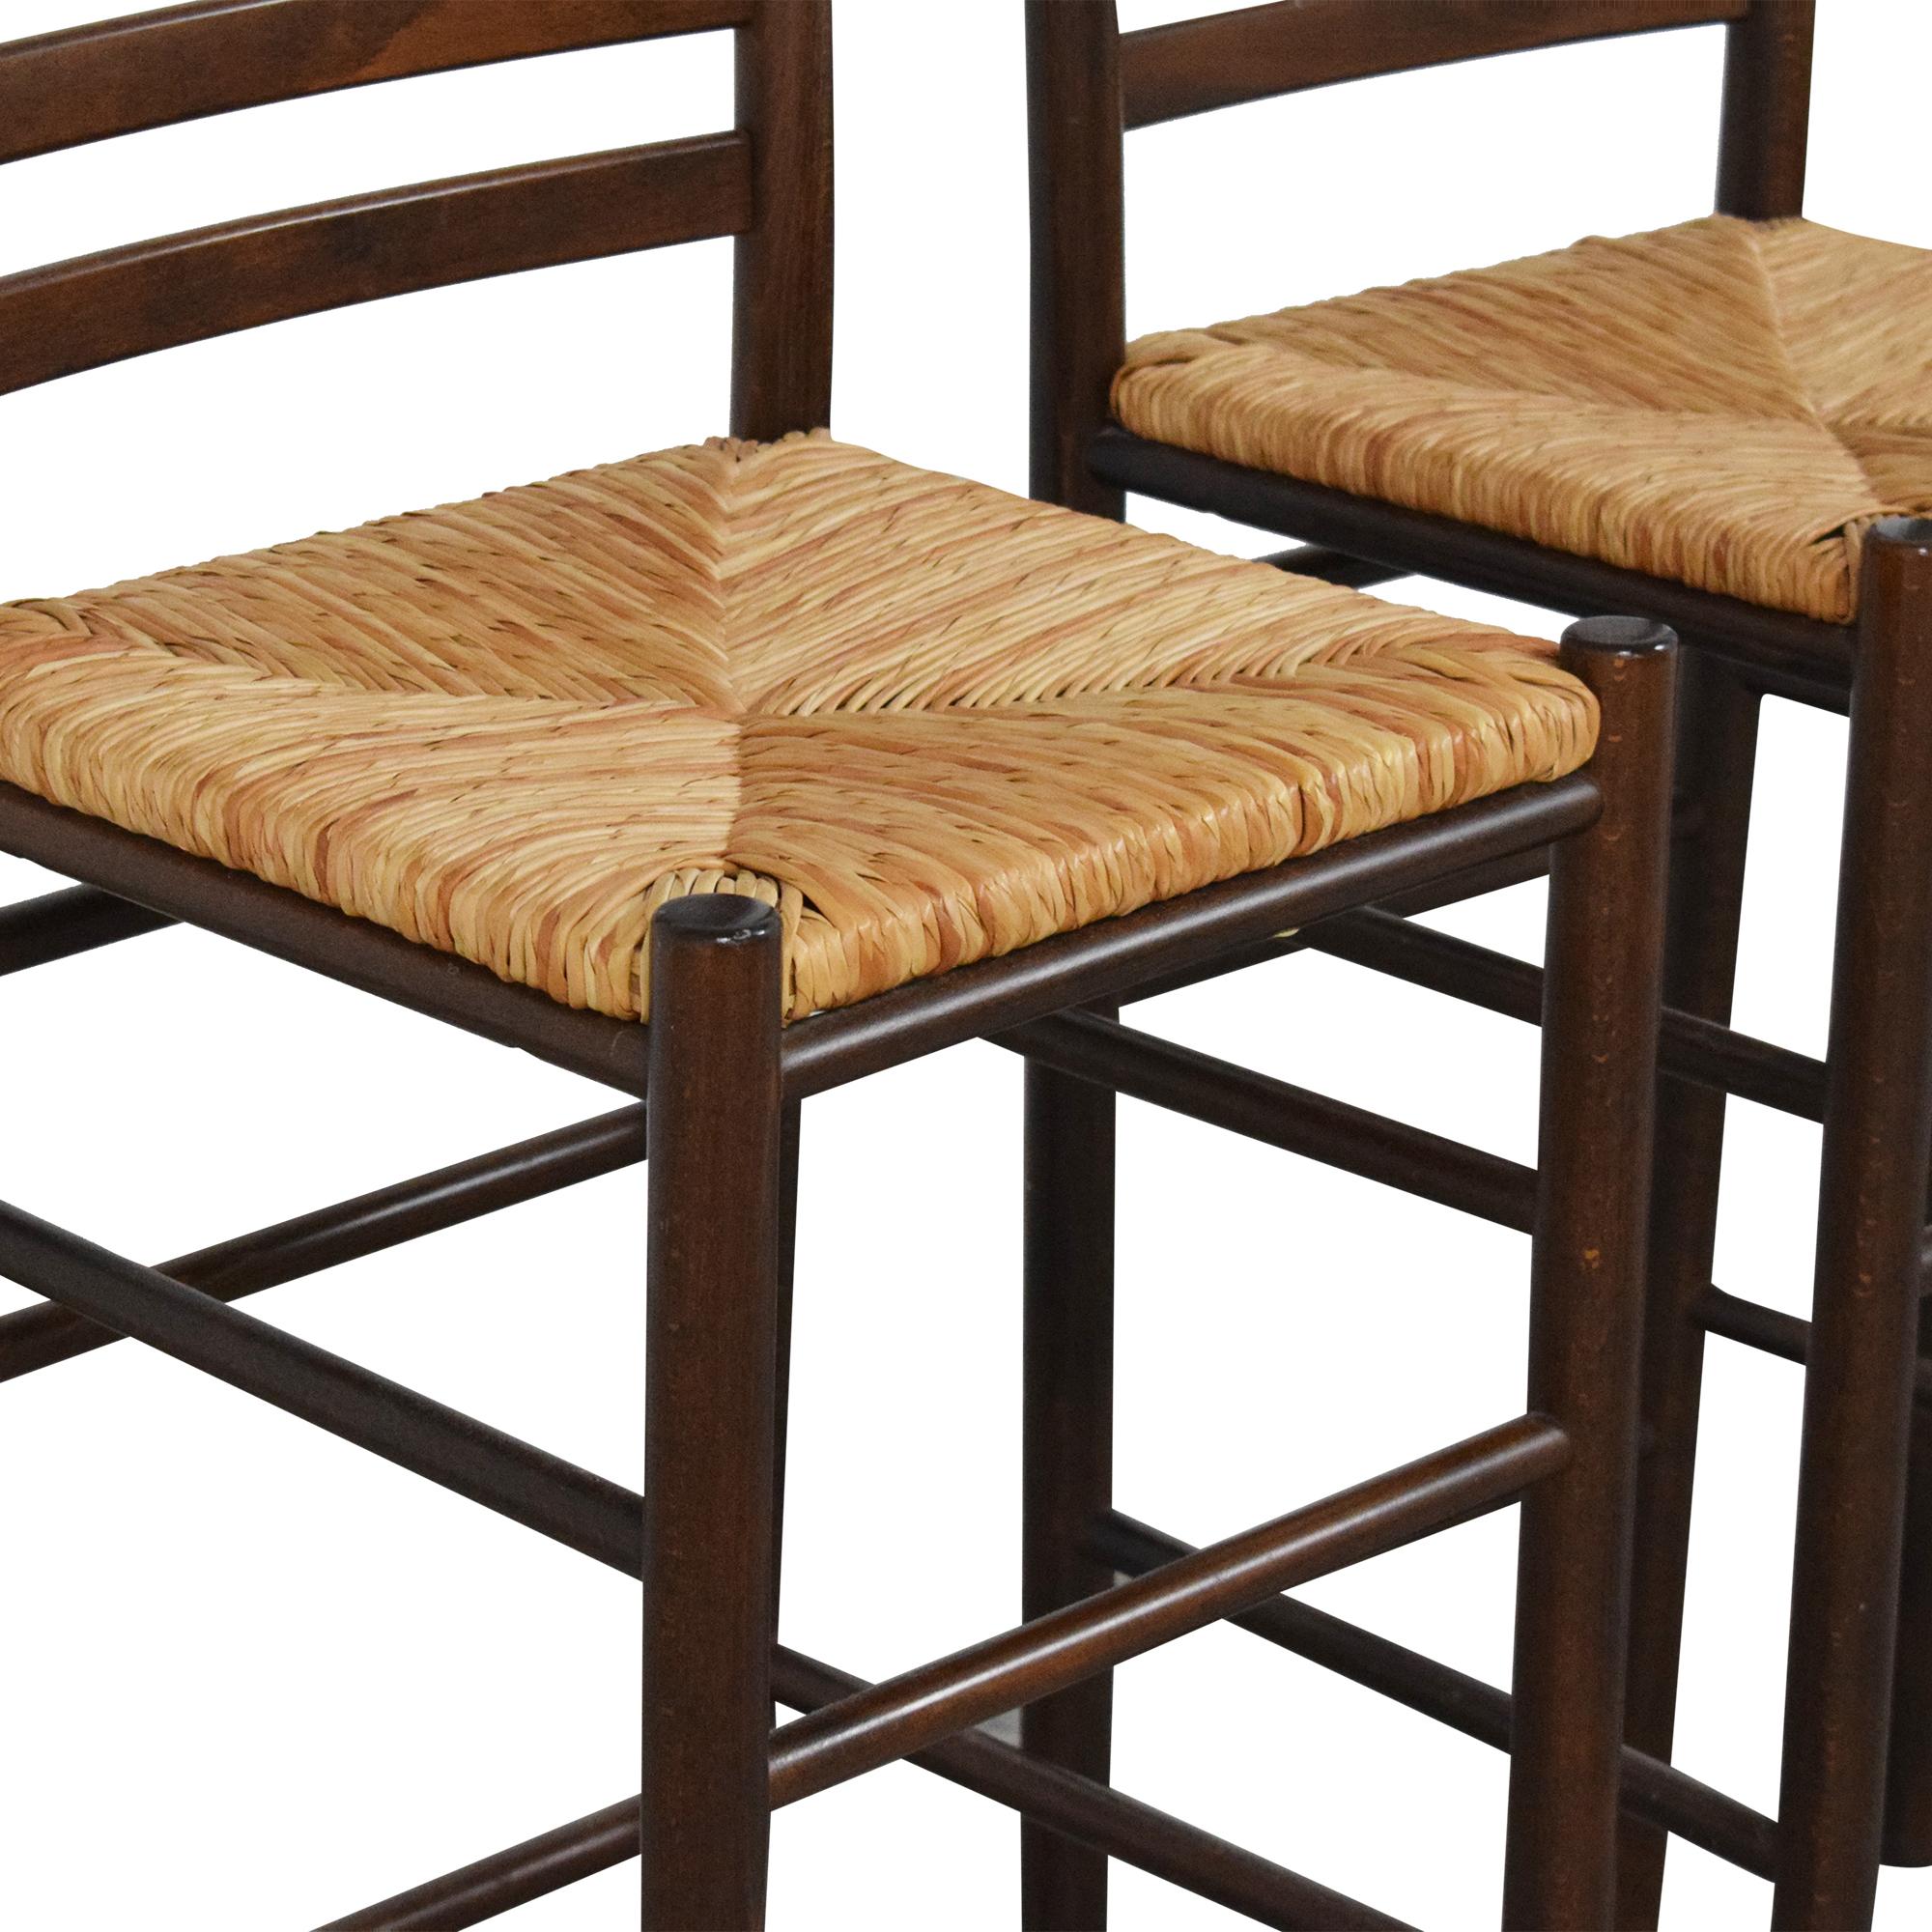 buy Pier 1 Pier 1 Woven Seat Bar Stools online